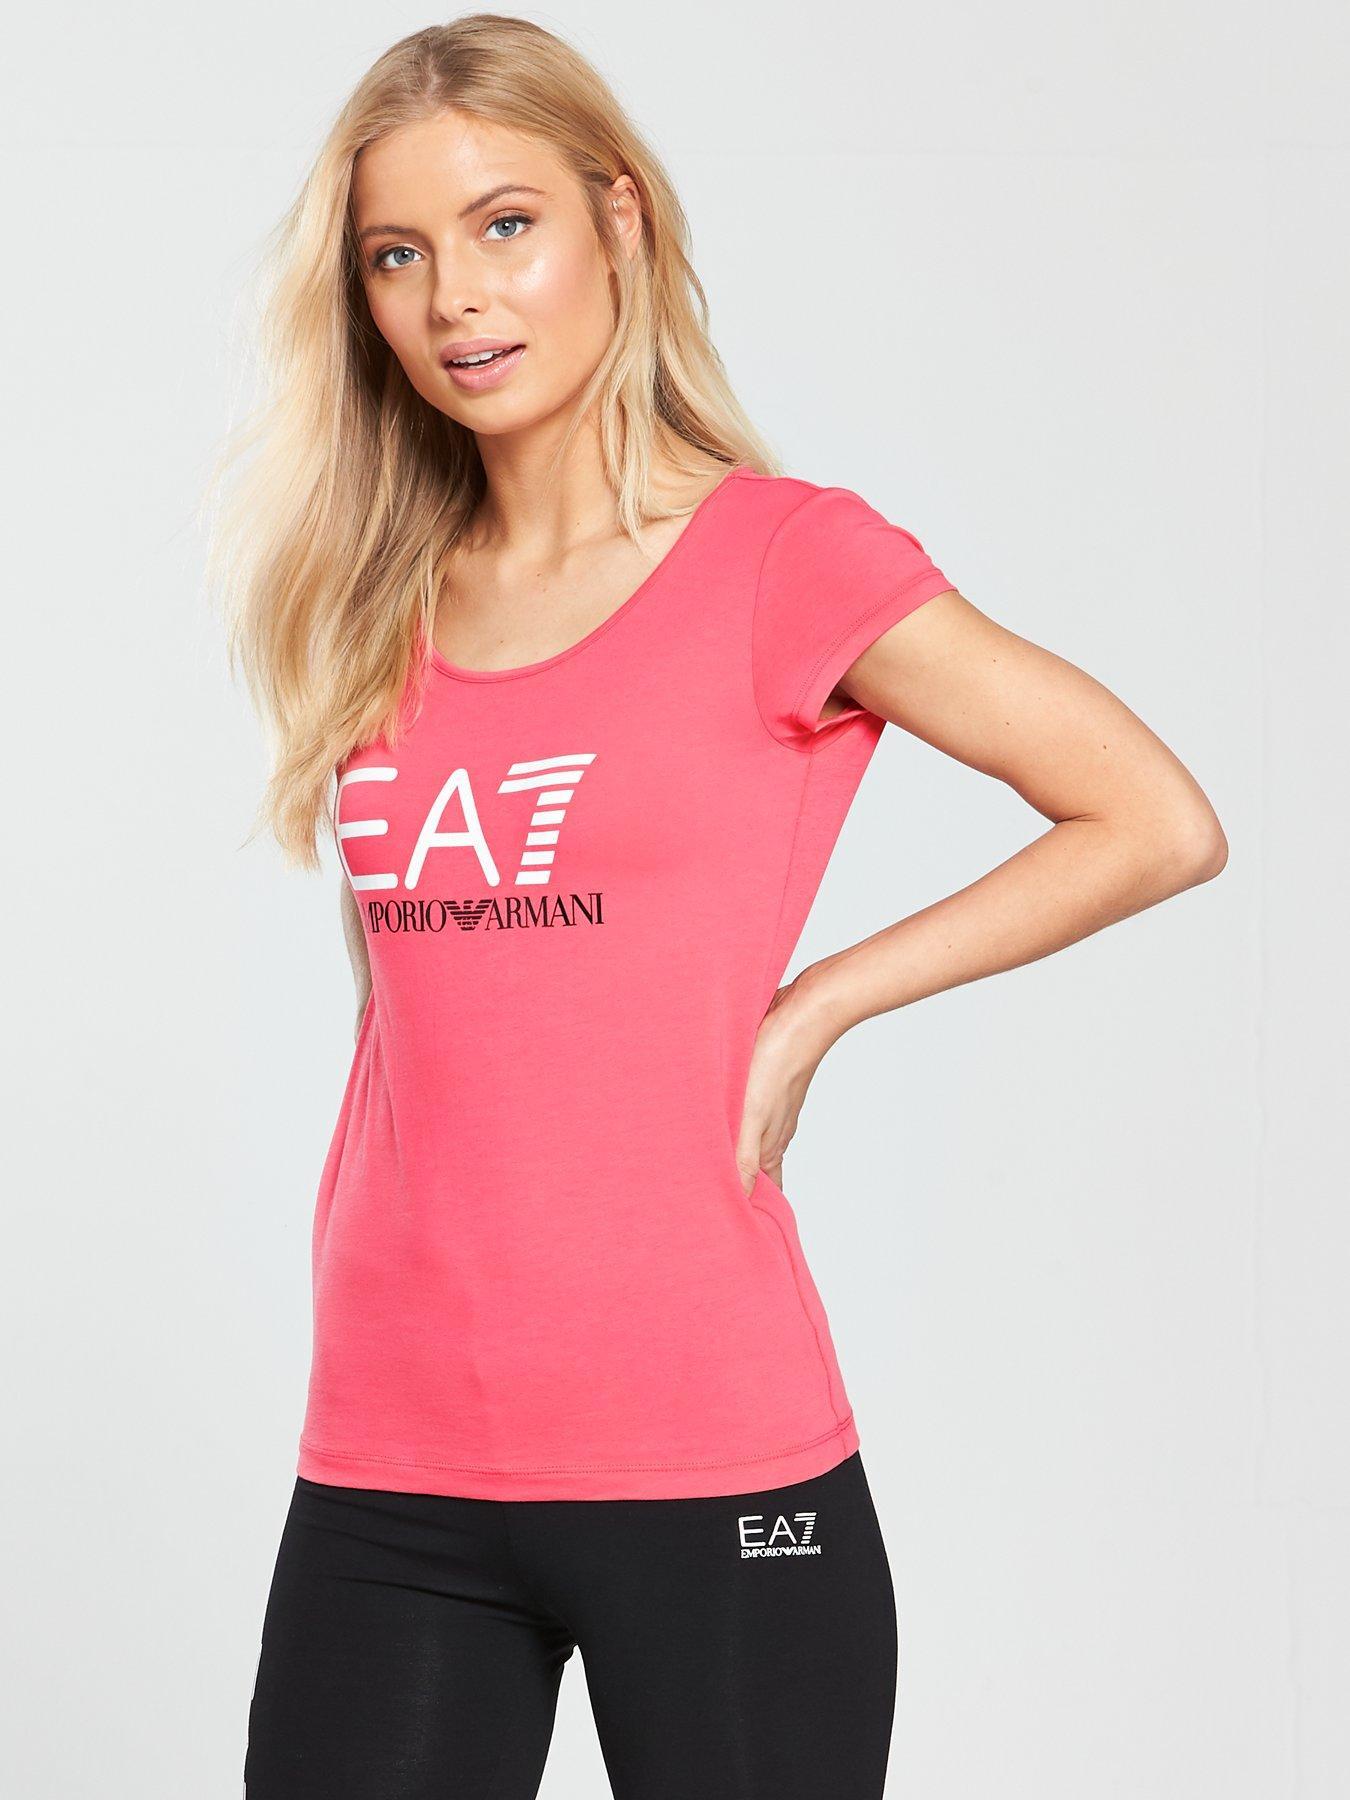 Womens Sports Shirt Emporio Armani Cheap Price Top Quality FF0FiuJg